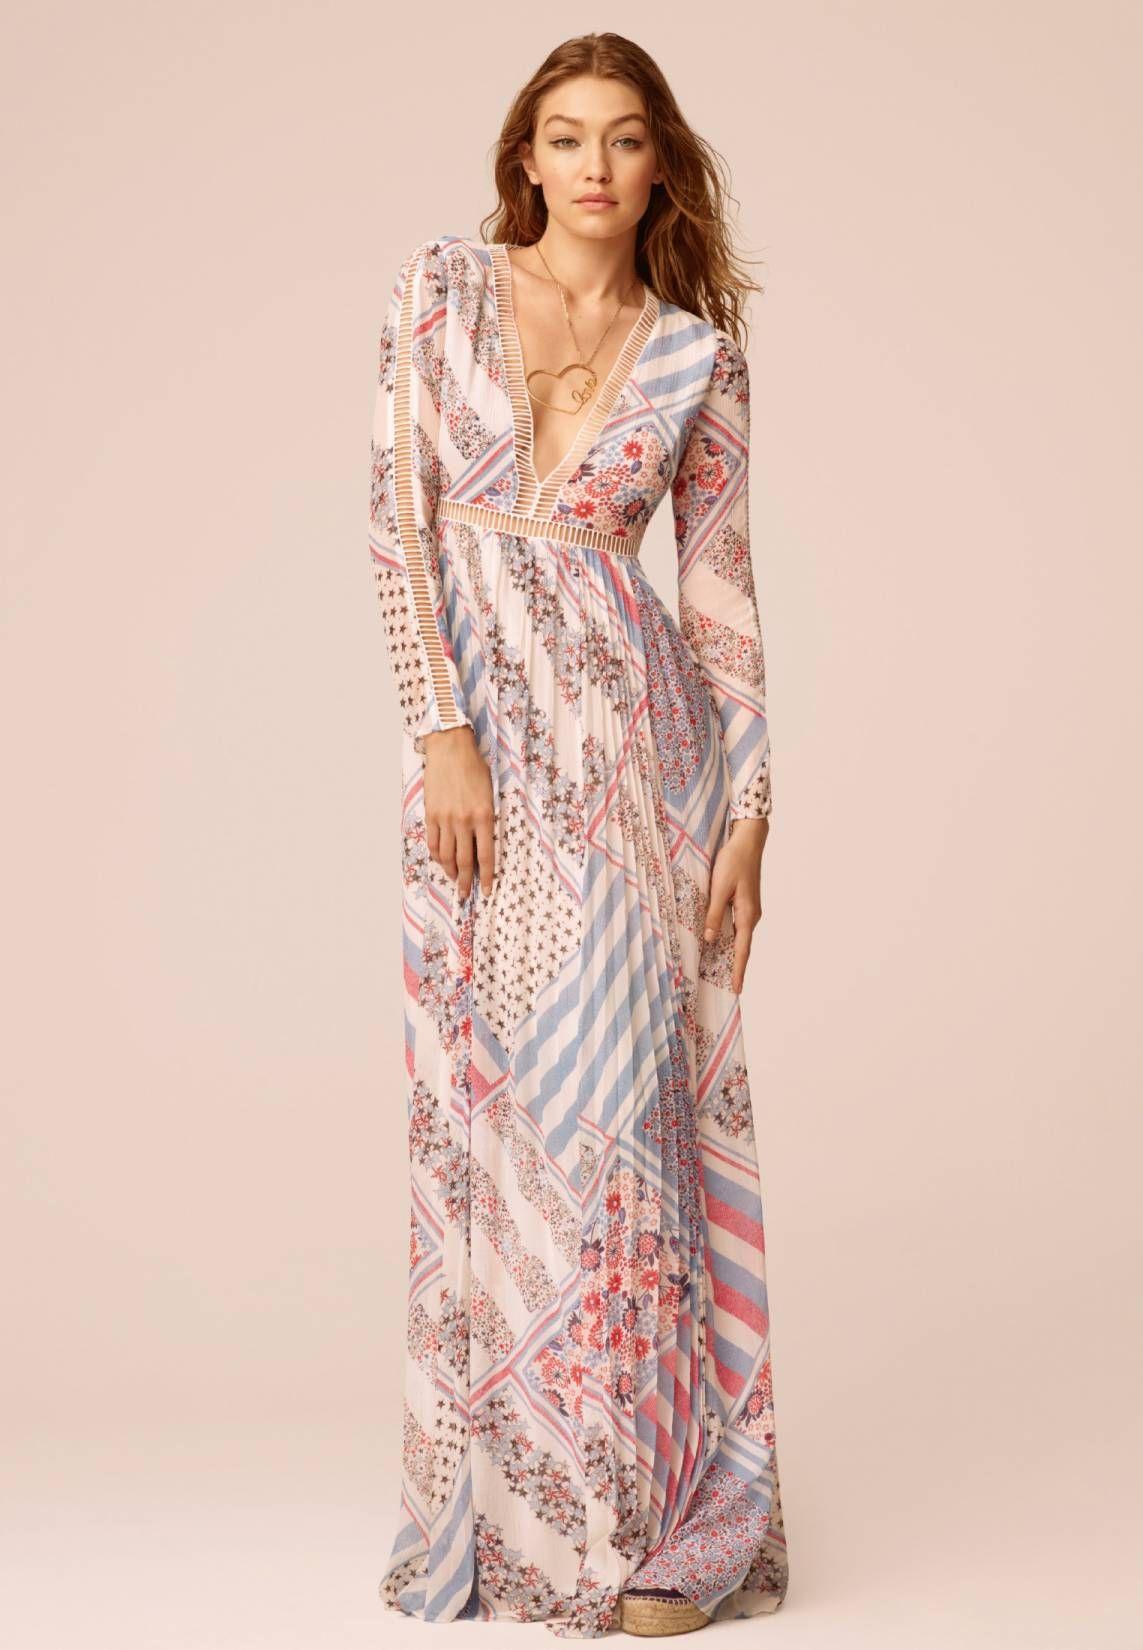 gigi hadid - maxi dress - white. sheer:semi-sheer. details